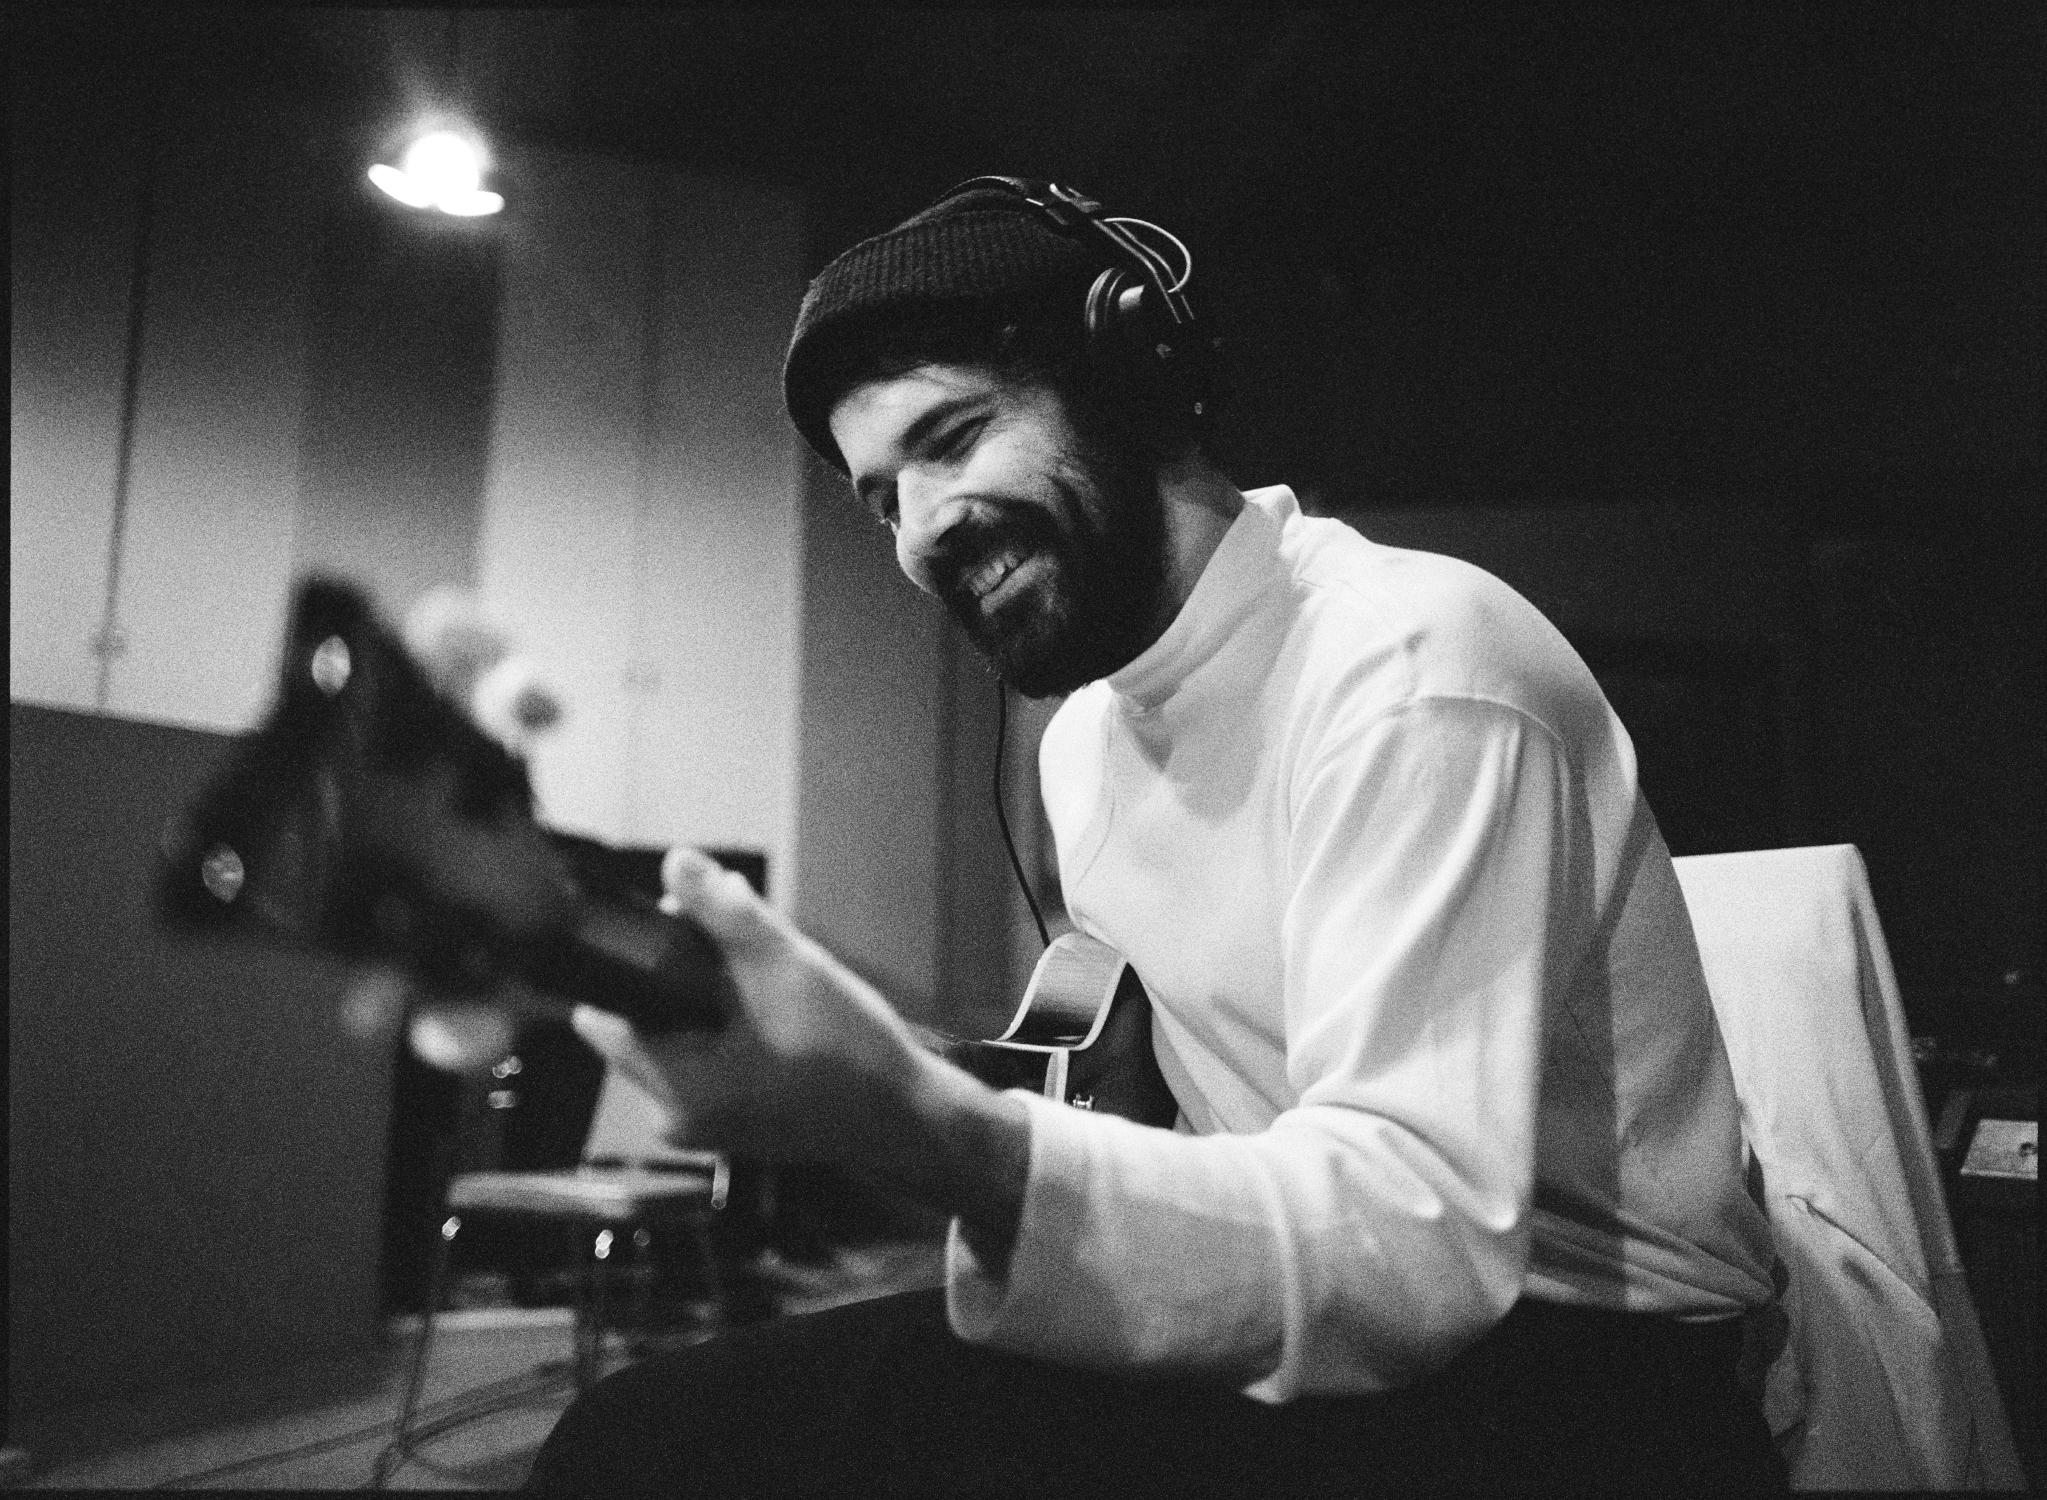 Jerry Bernhardt recording at Sam Phillips Recording in Memphis, TN